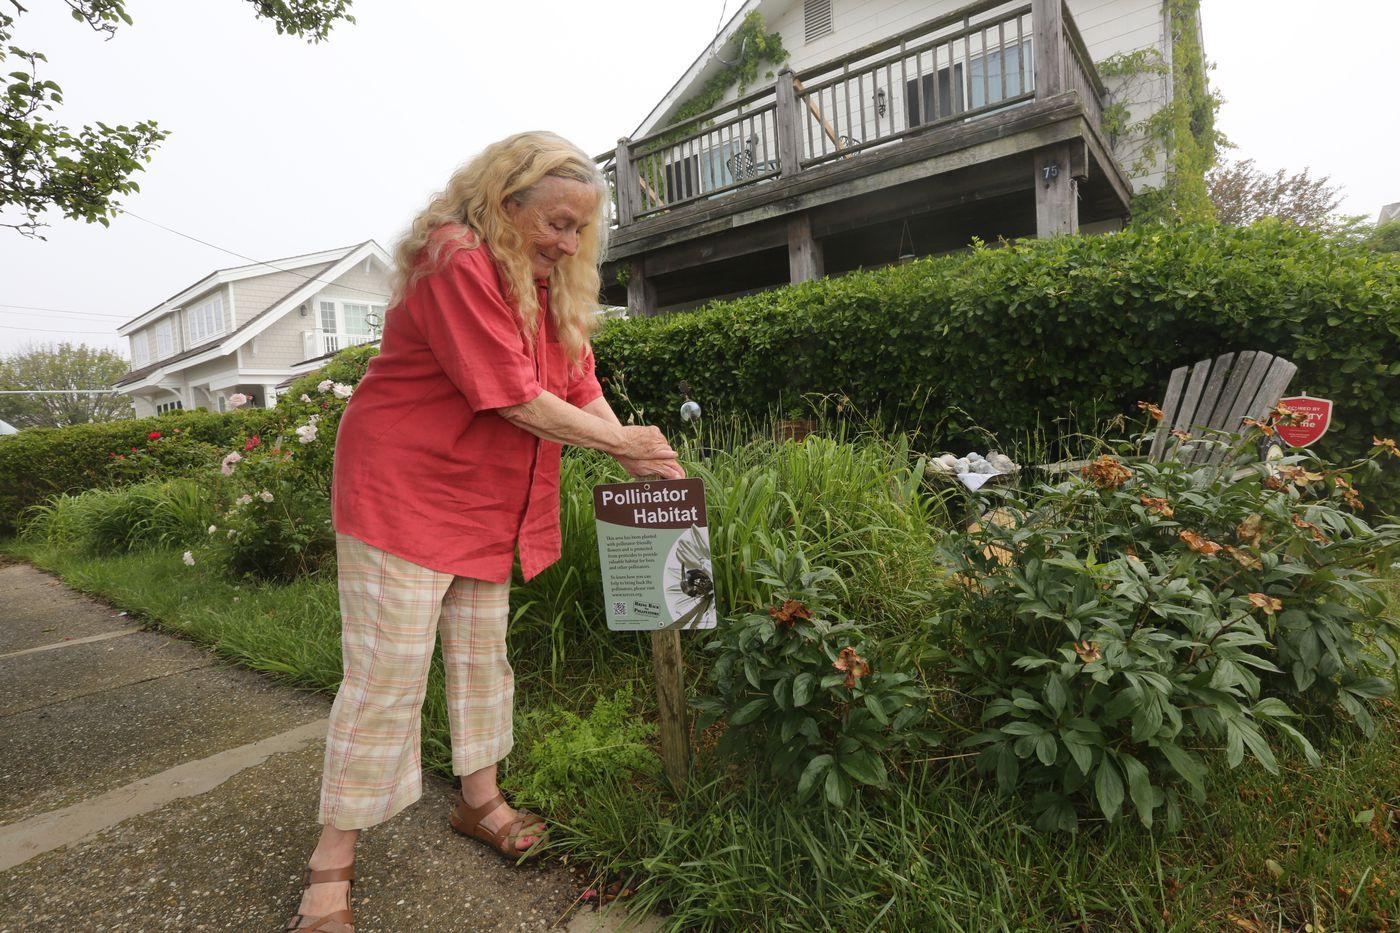 An eyesore or environmental attraction? Jersey Shore